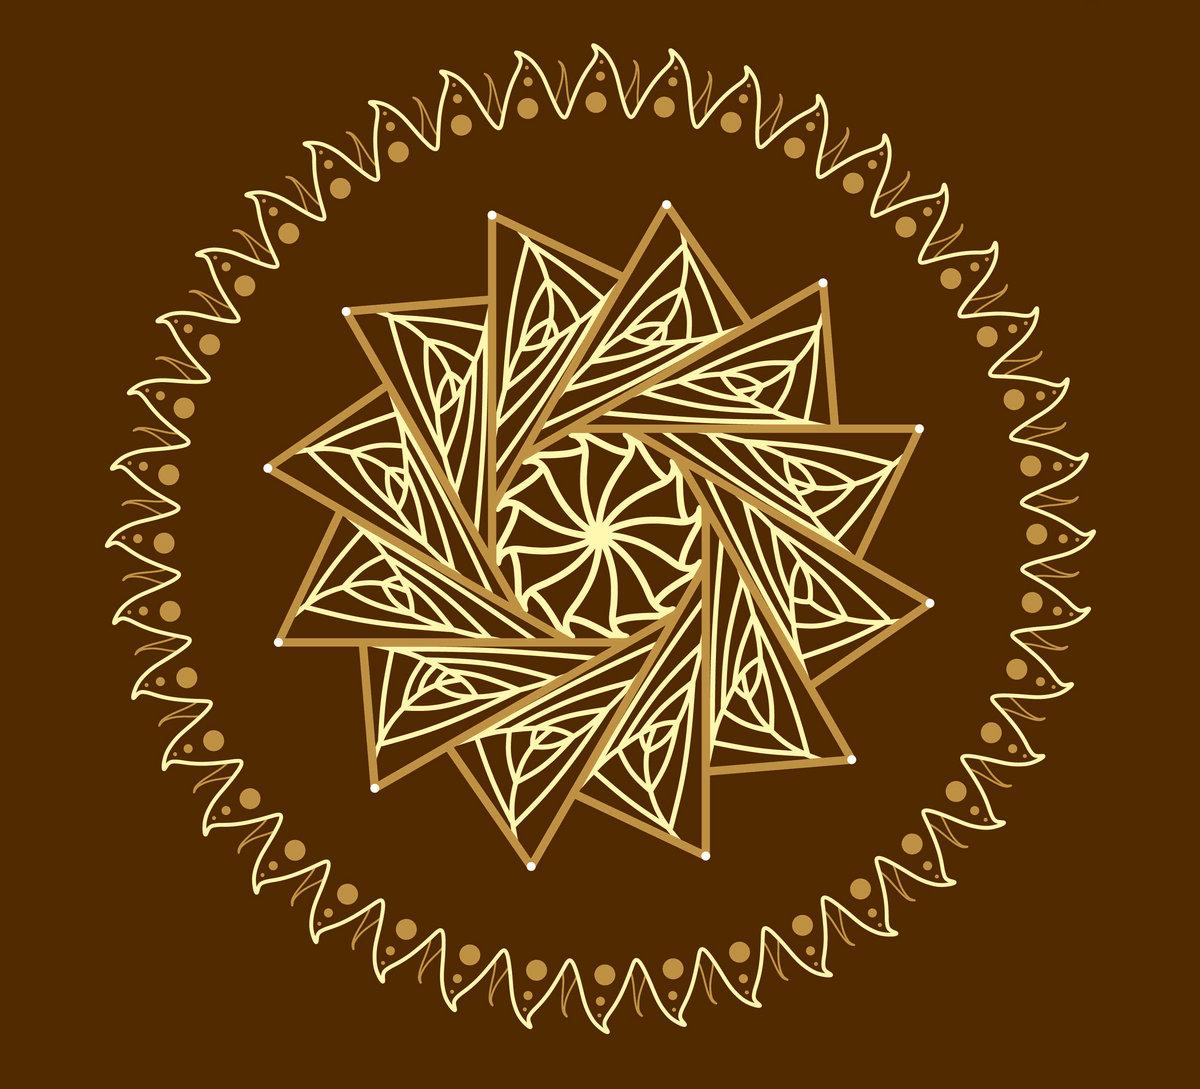 richard-norris-music-for-healing-august